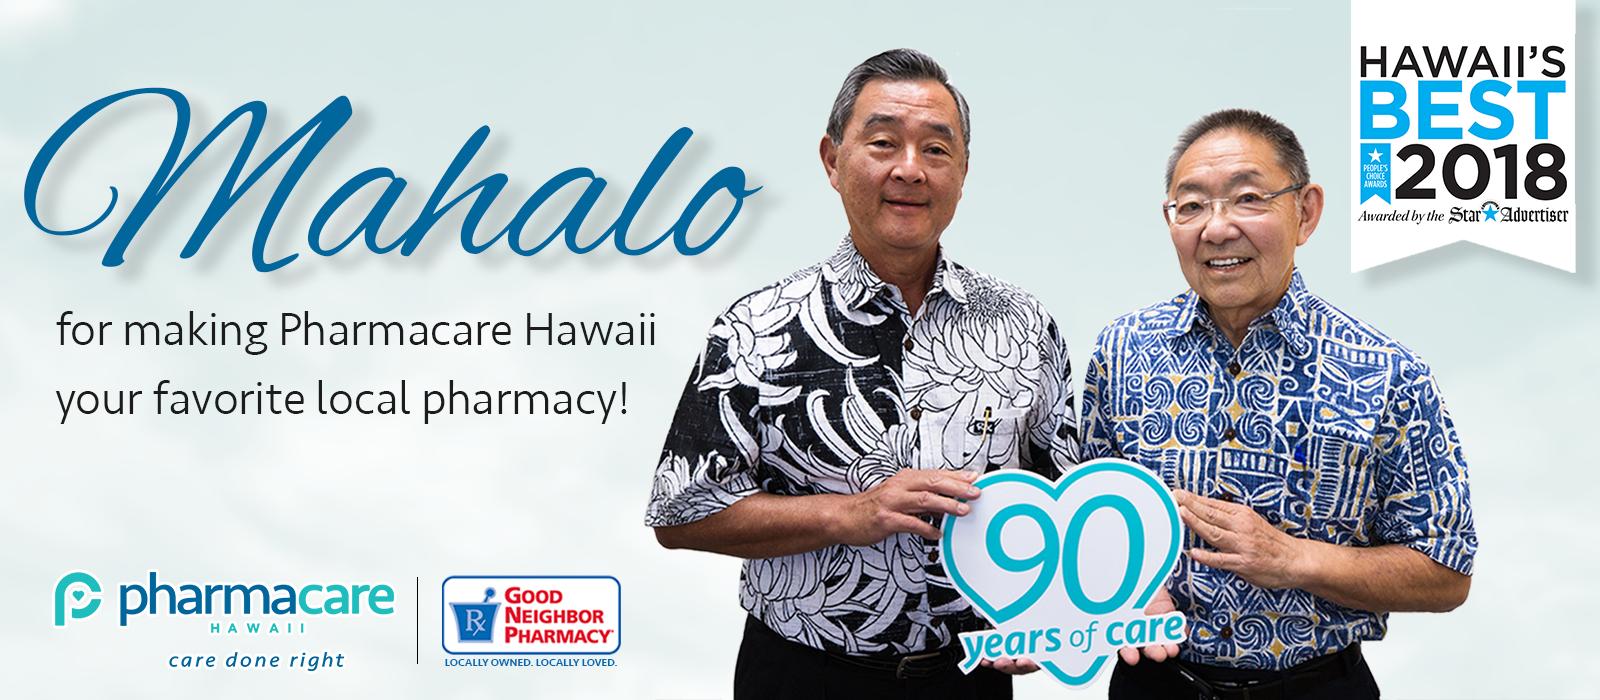 Star Advertiser_Hawaii's Best 2018 - Website Banner.png